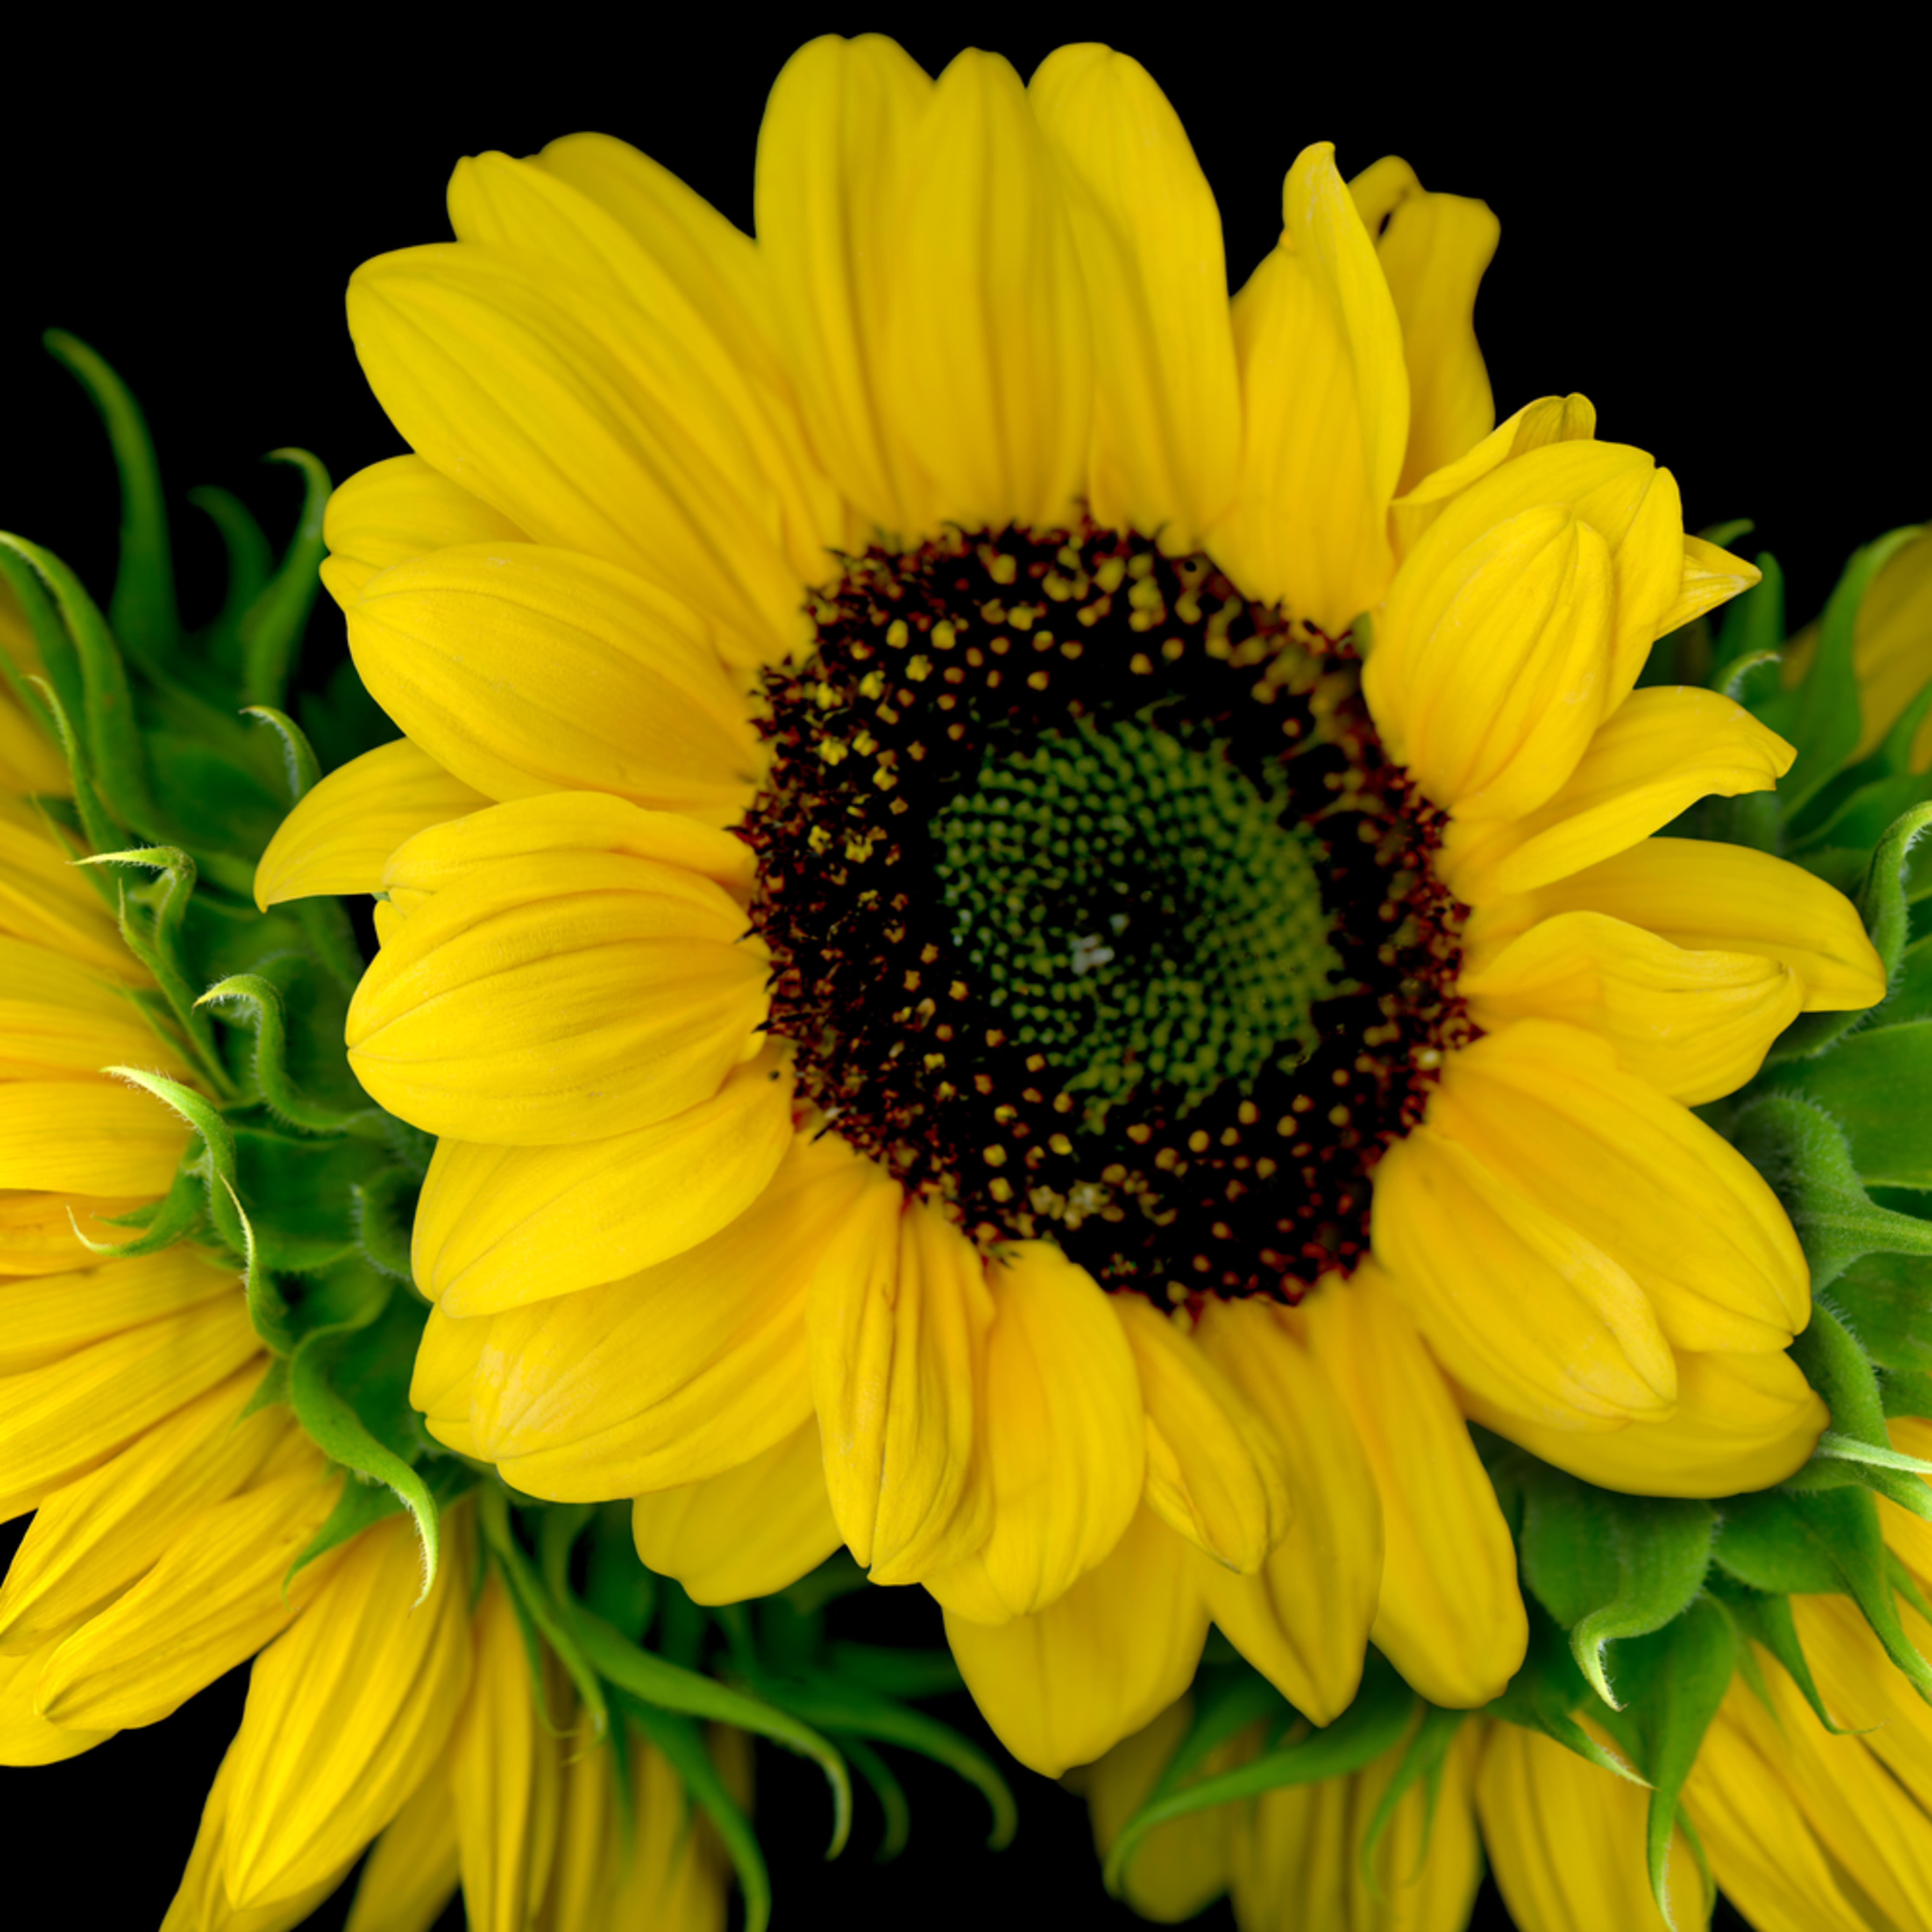 080502 ahern triple sunflower 30x40x300 eculvv